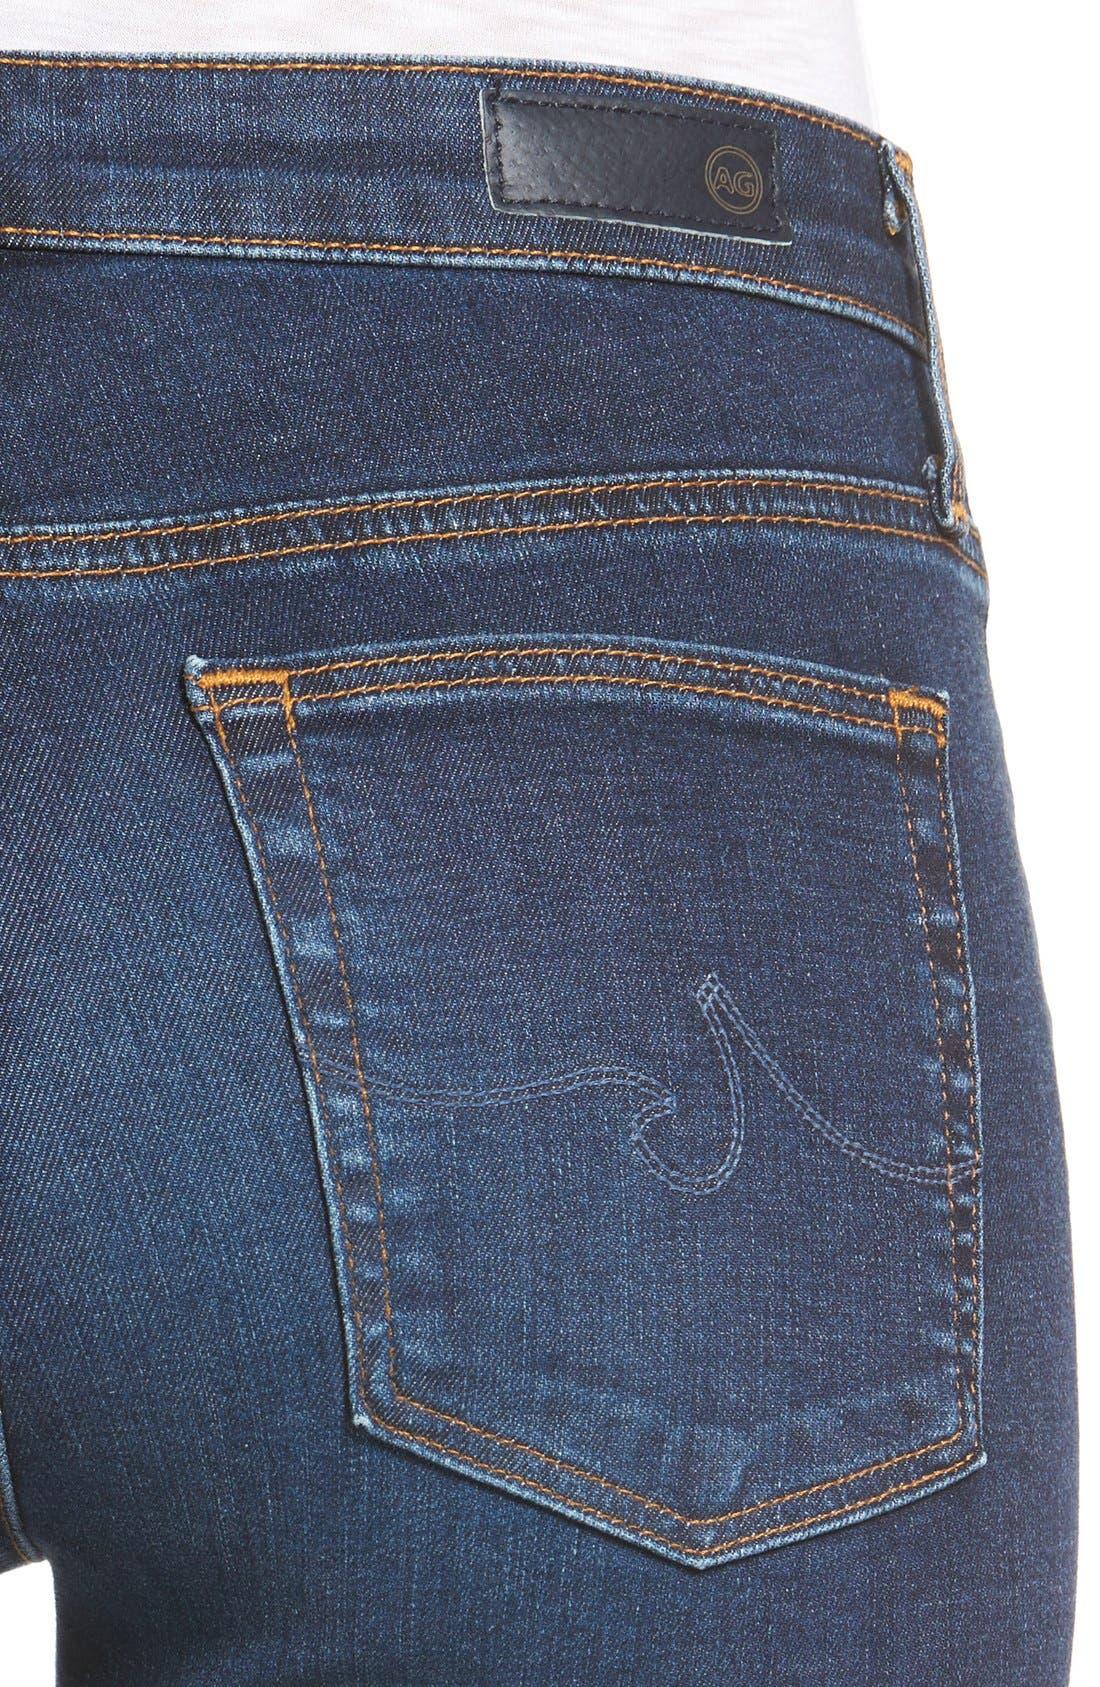 'The Farrah' High Rise Skinny Jeans,                             Alternate thumbnail 55, color,